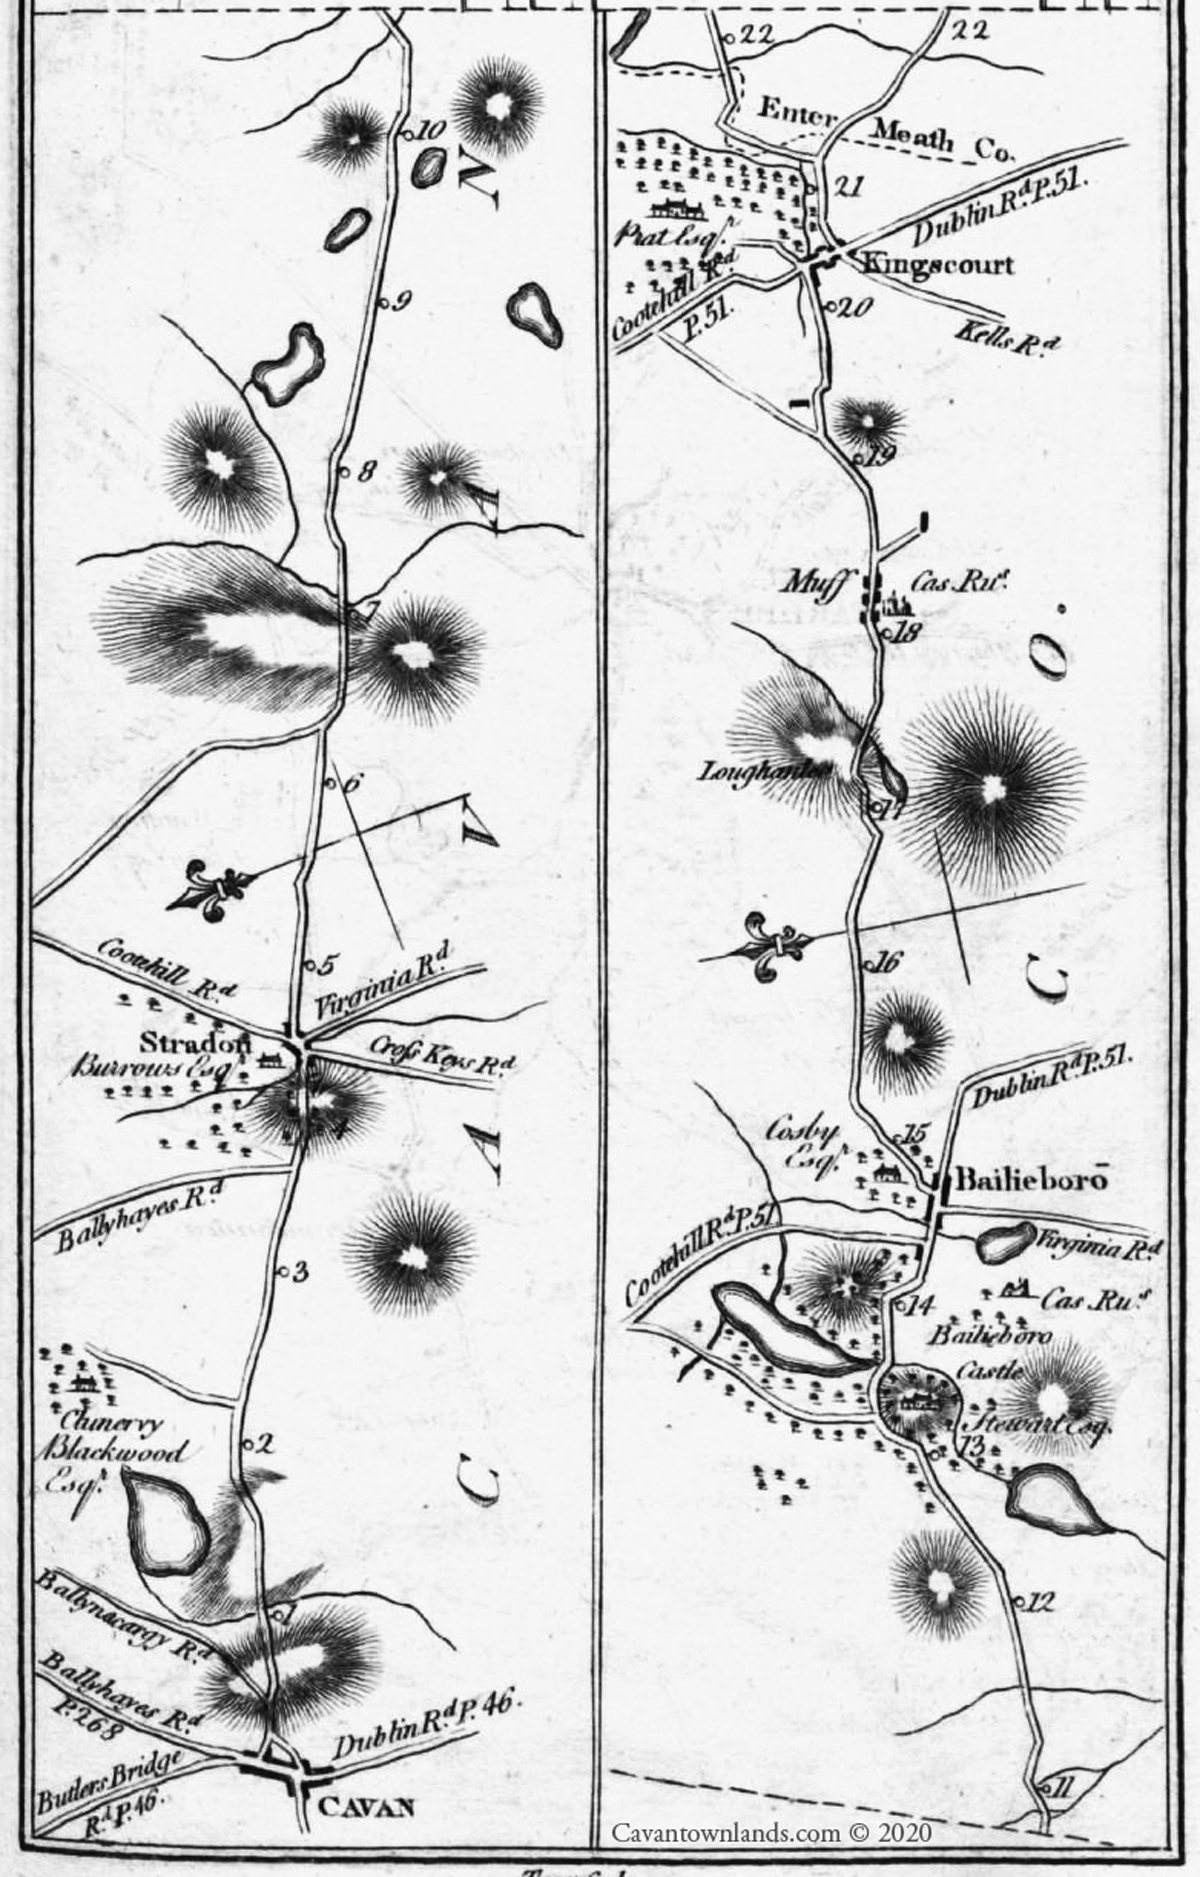 251-Cavan-Stradone-Bailieborough-Kingscourt